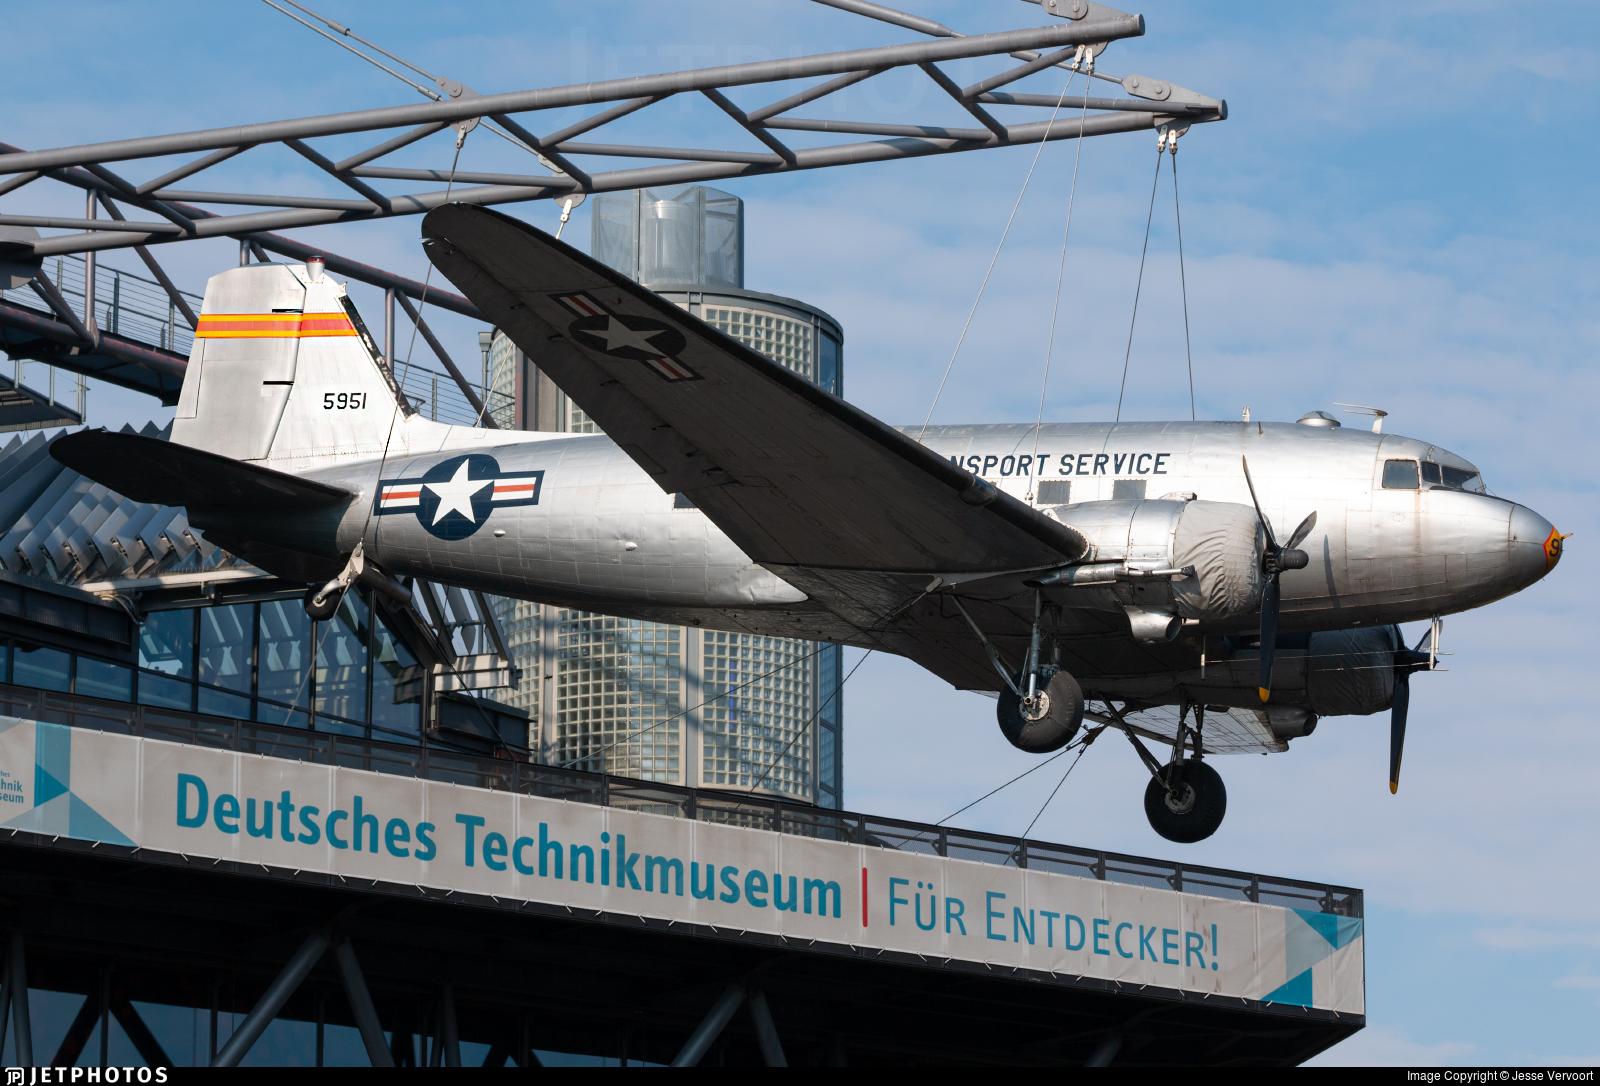 45-0951 - Douglas C-47B Skytrain - United States - US Air Force (USAF)